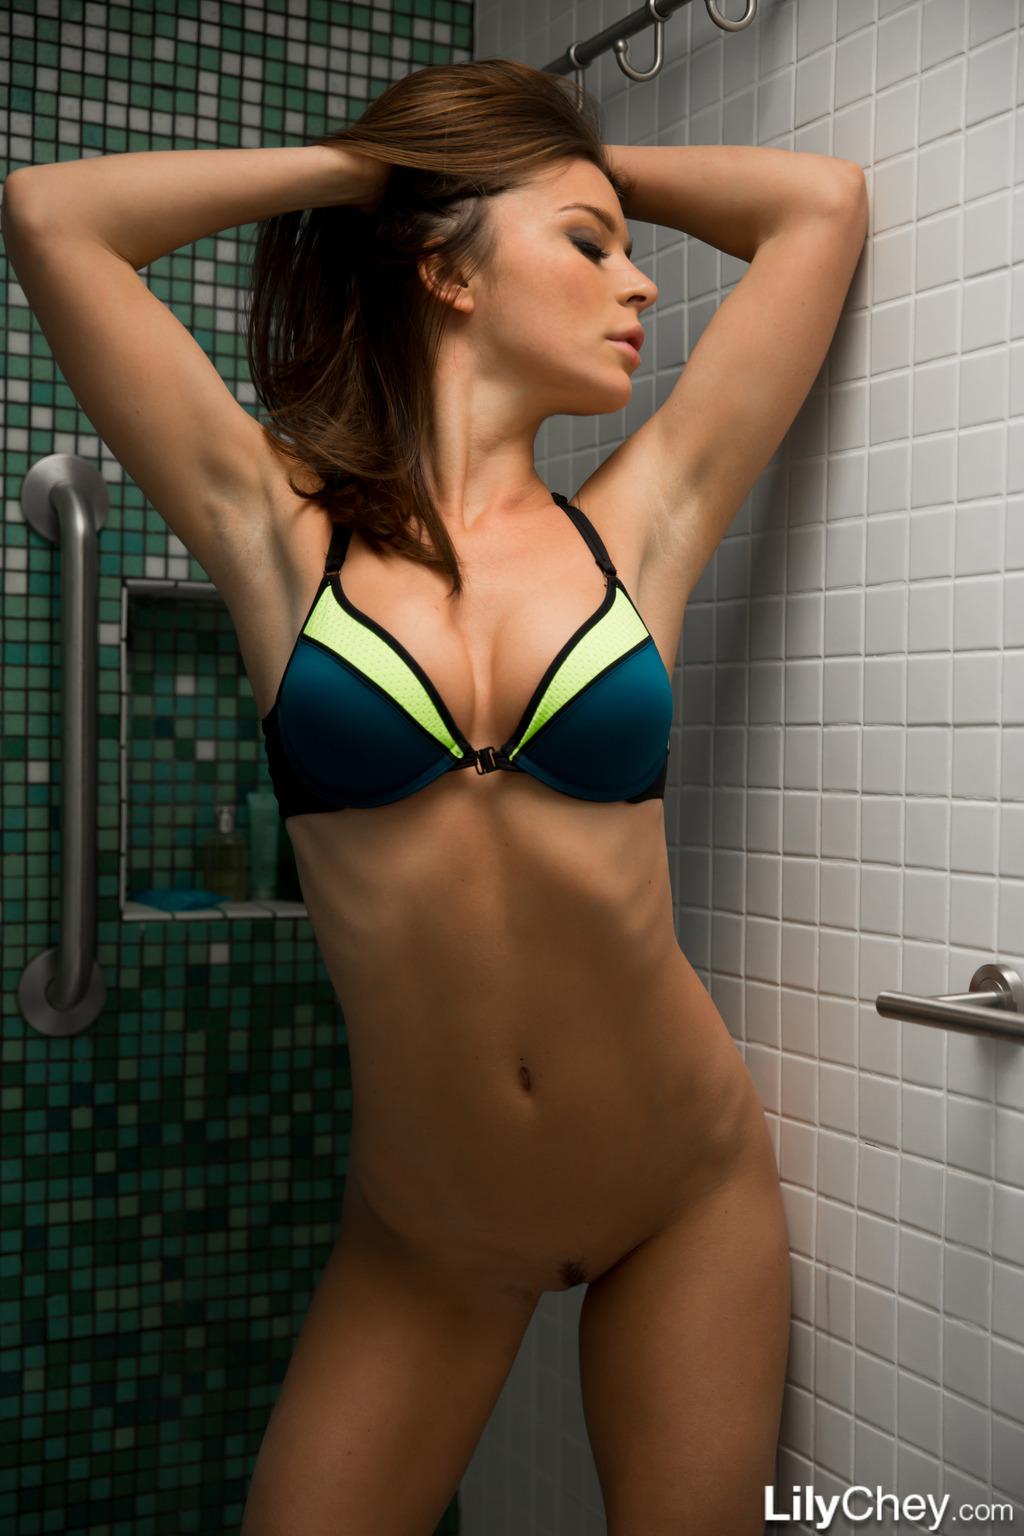 Lily Chey In Bikini Shower 14